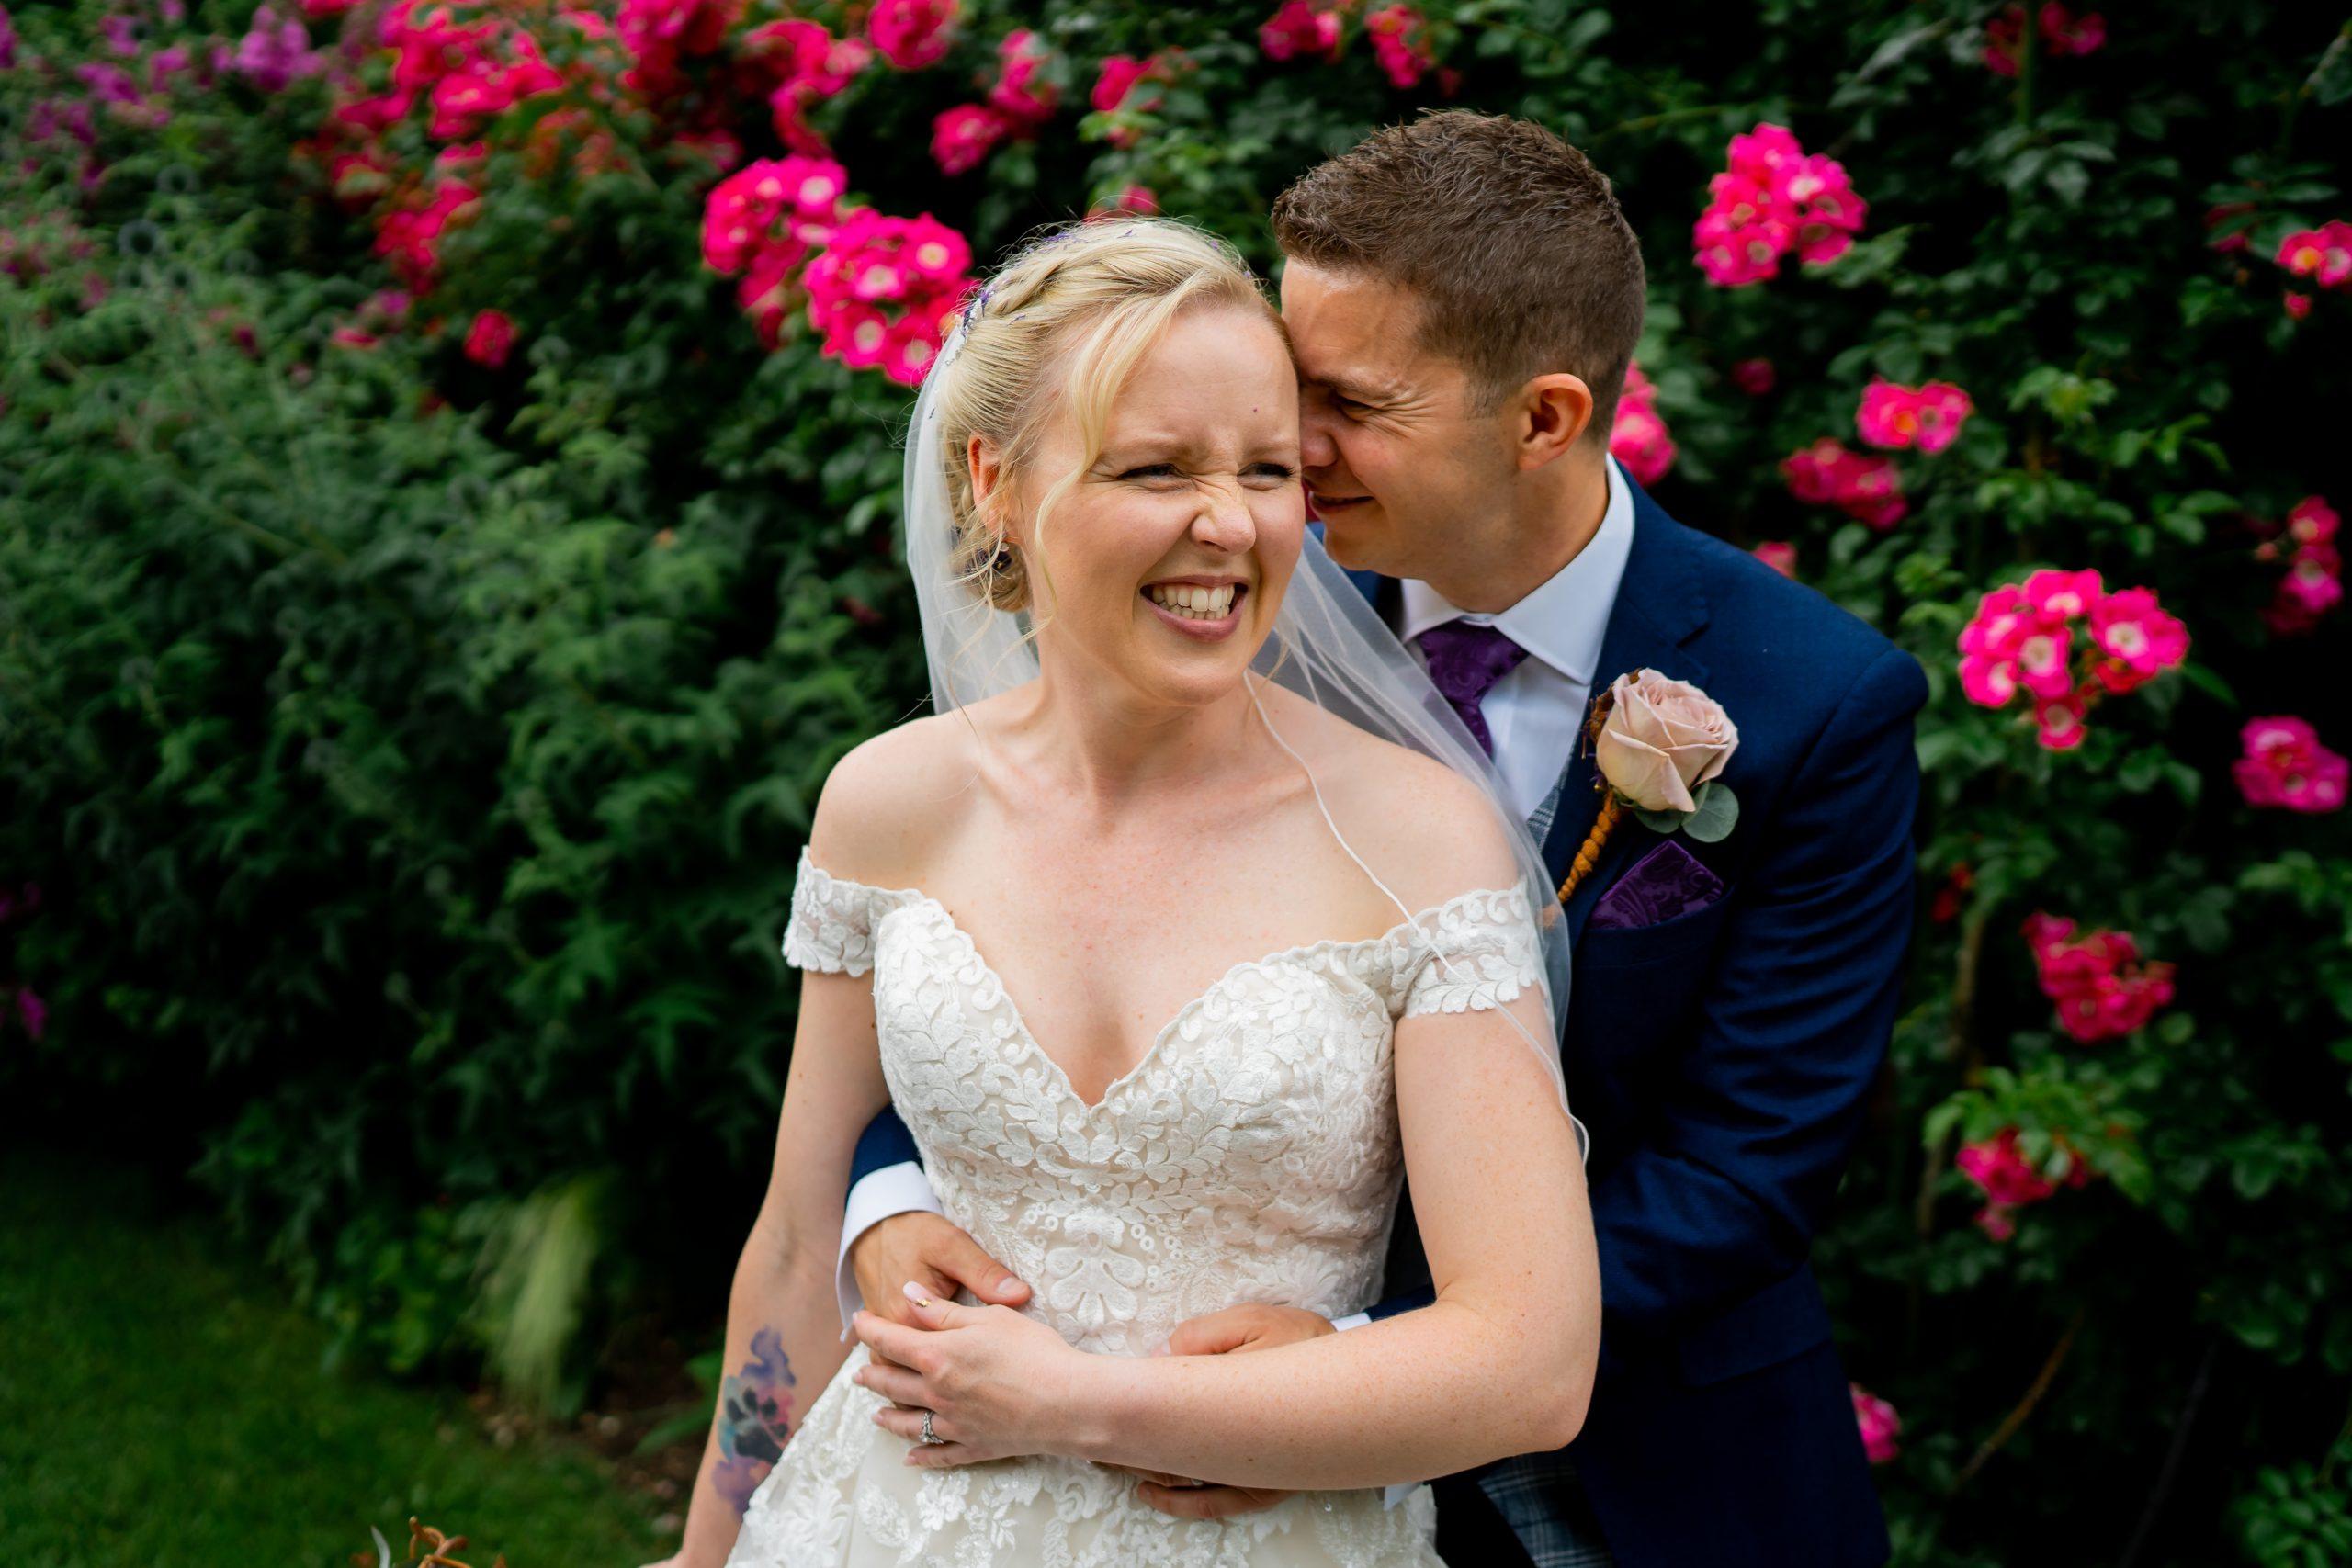 kim & tim real wedding blog featured image